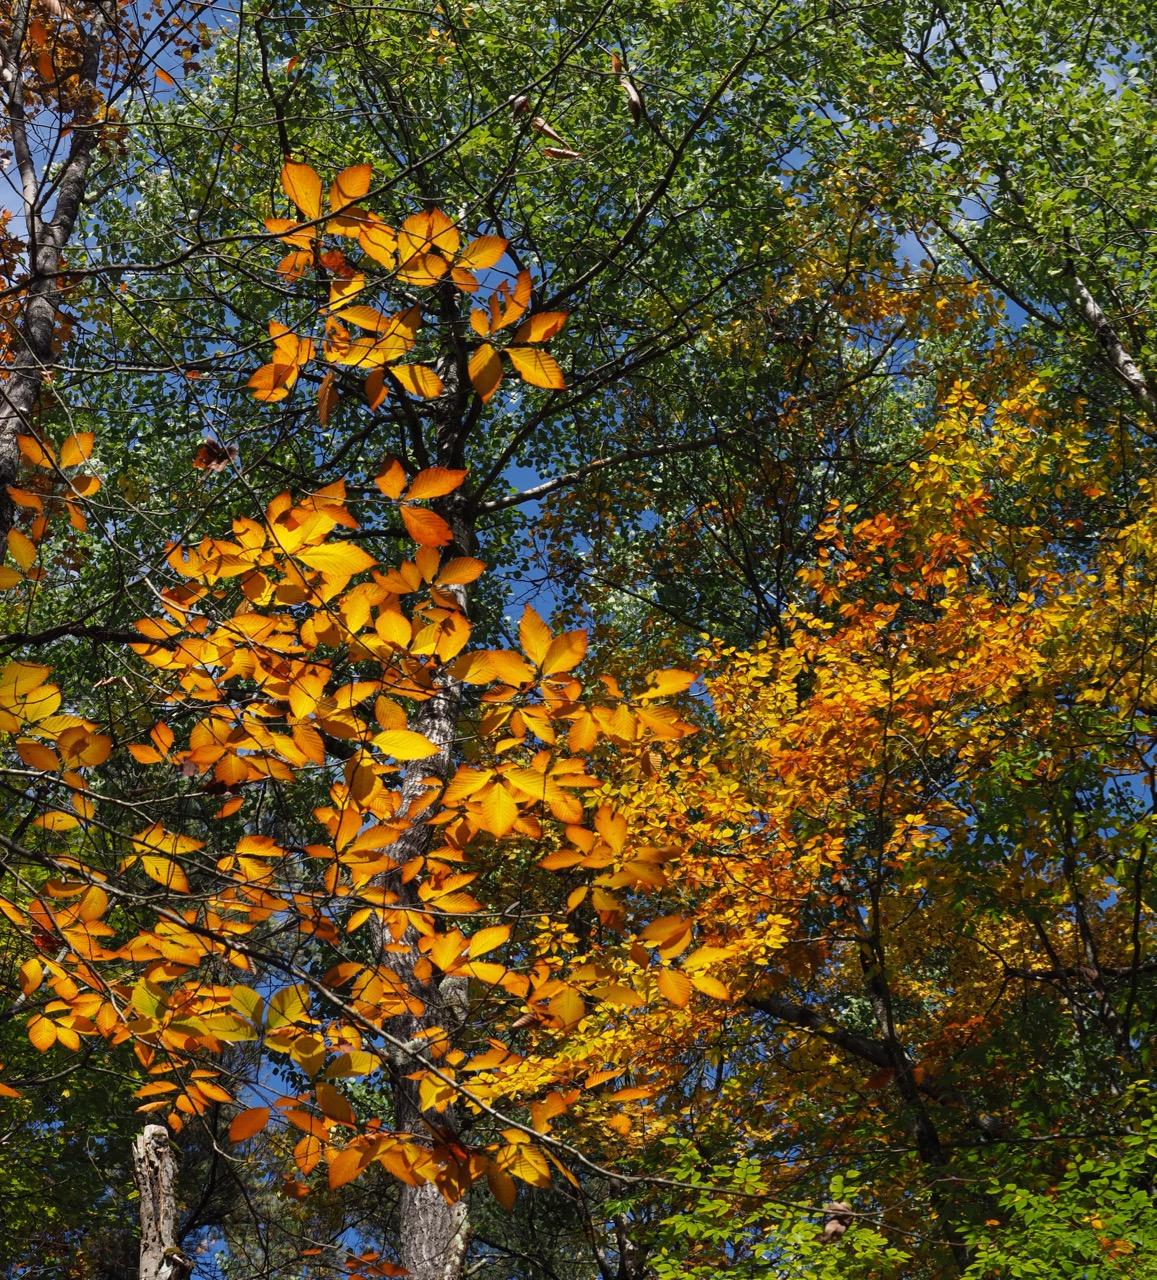 P8-orange leaves towards sky-PA100181.jpg